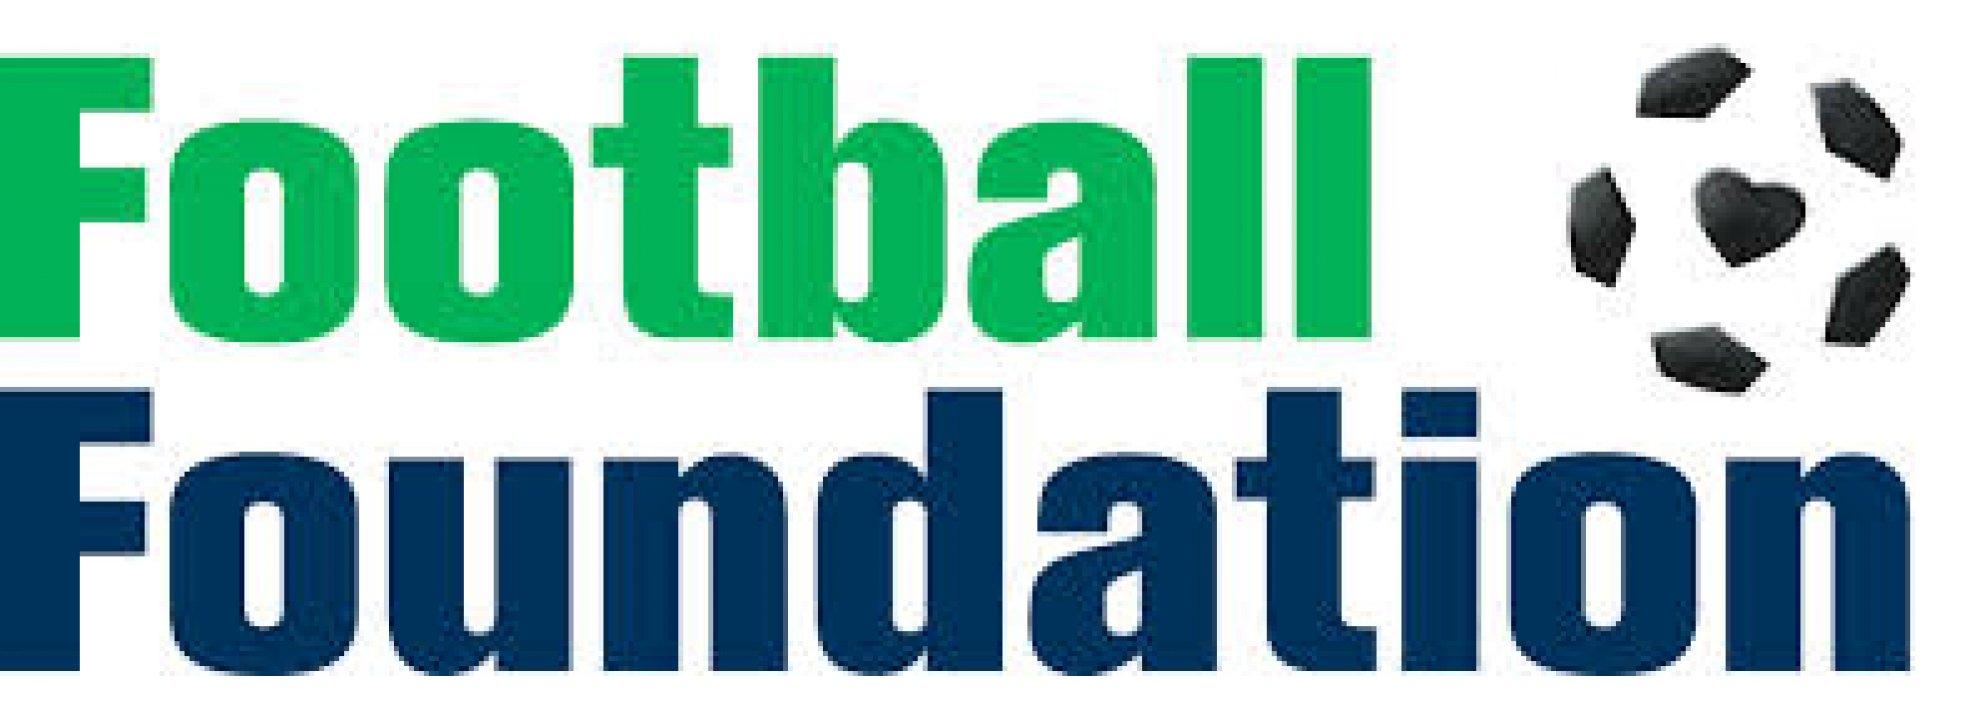 Football Stadia Improvement Fund Banner